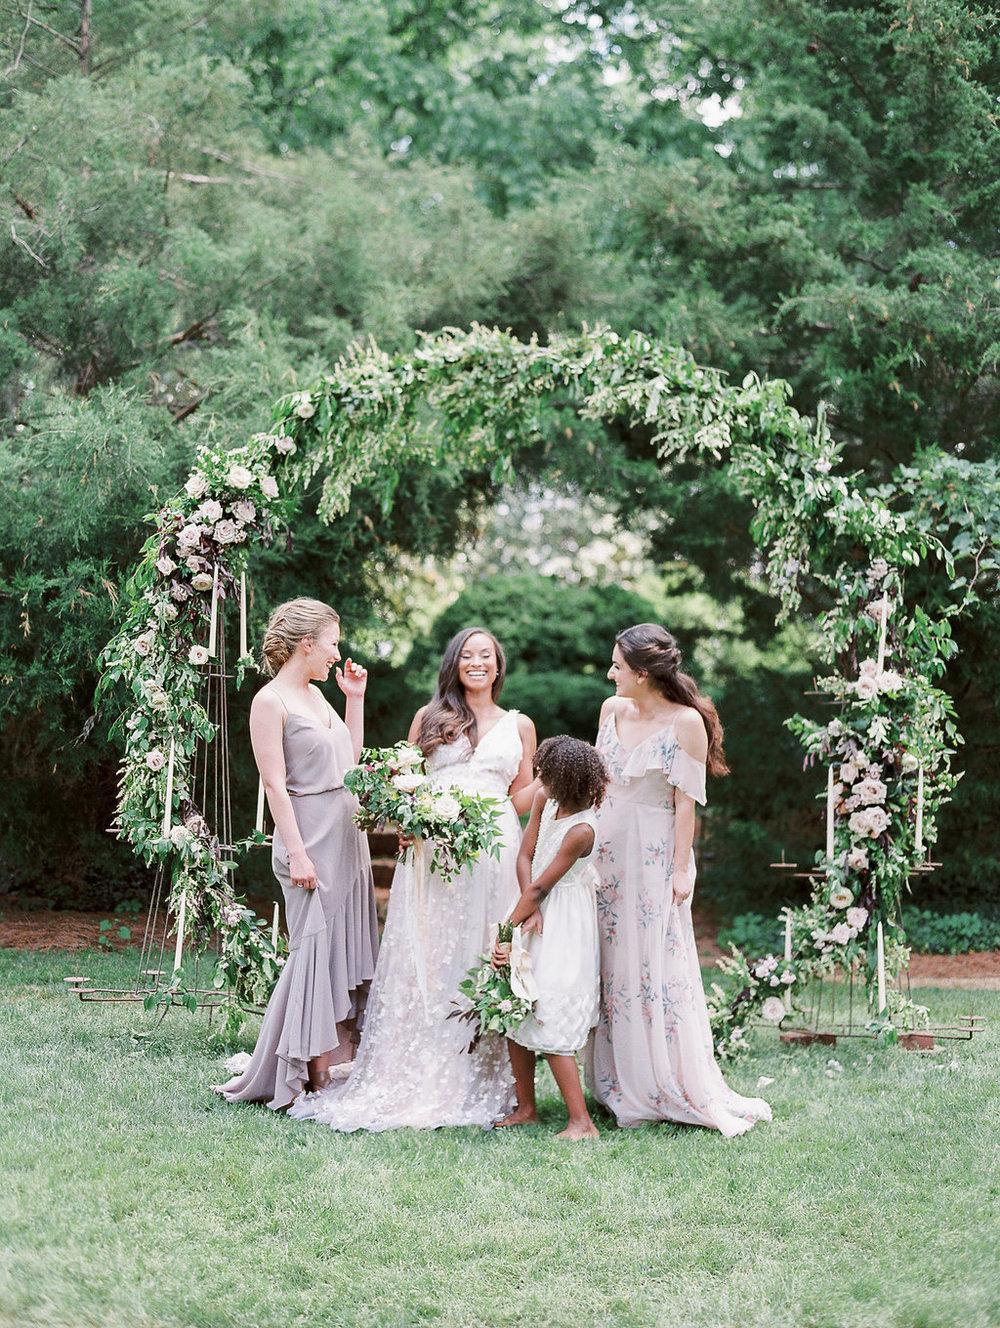 Adoption-editorial-marietta-conference-cetner-wedding-atlanta-wedding-photographer-27.jpg